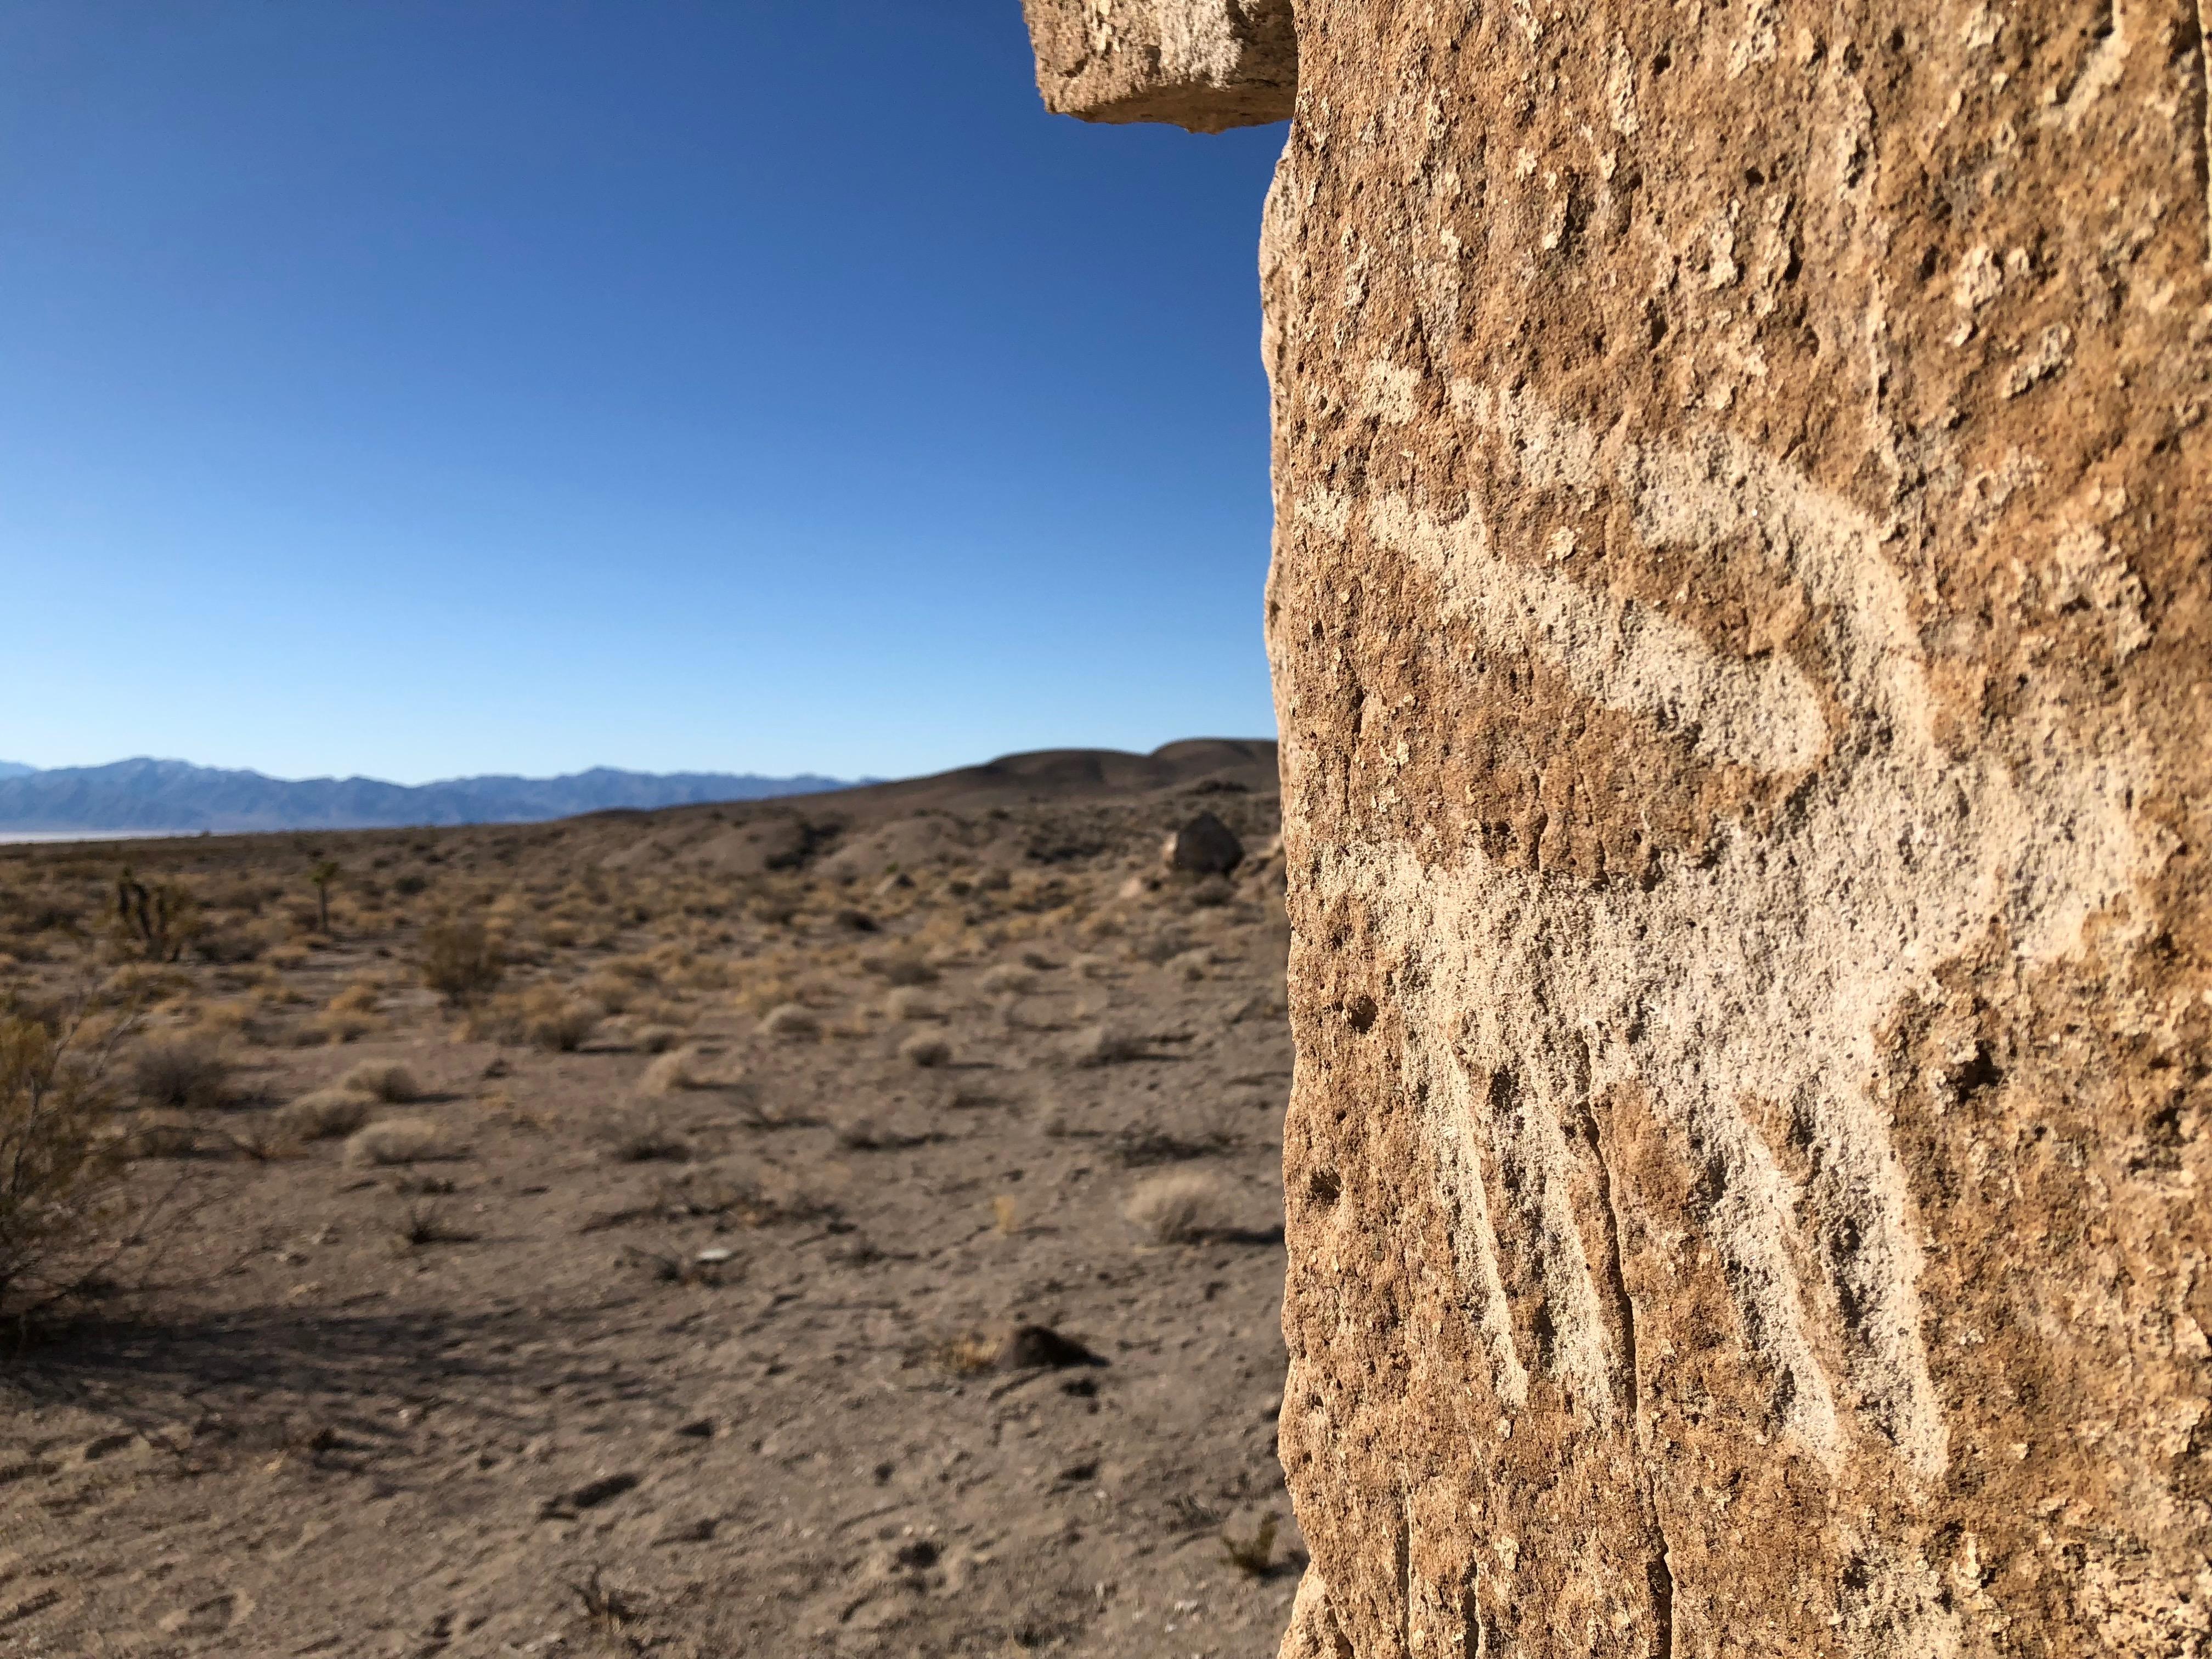 A petroglyph of a bighord sheep